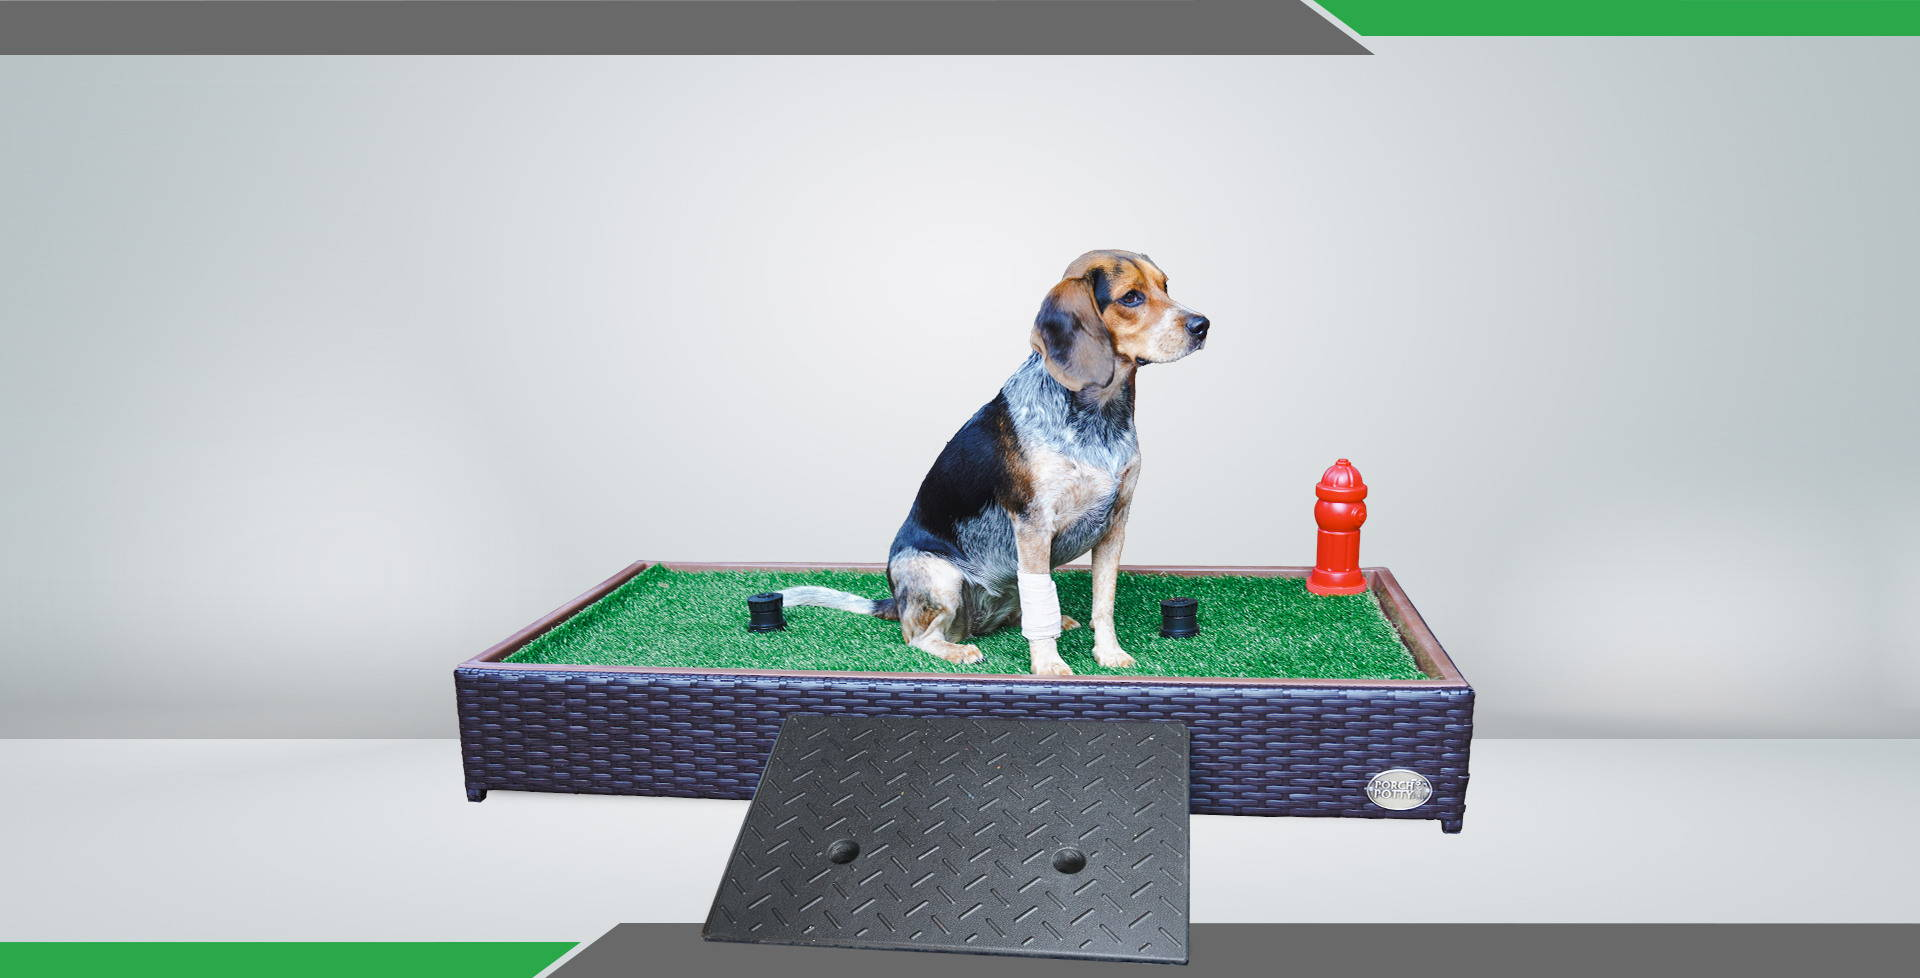 dog ramp for porch potty